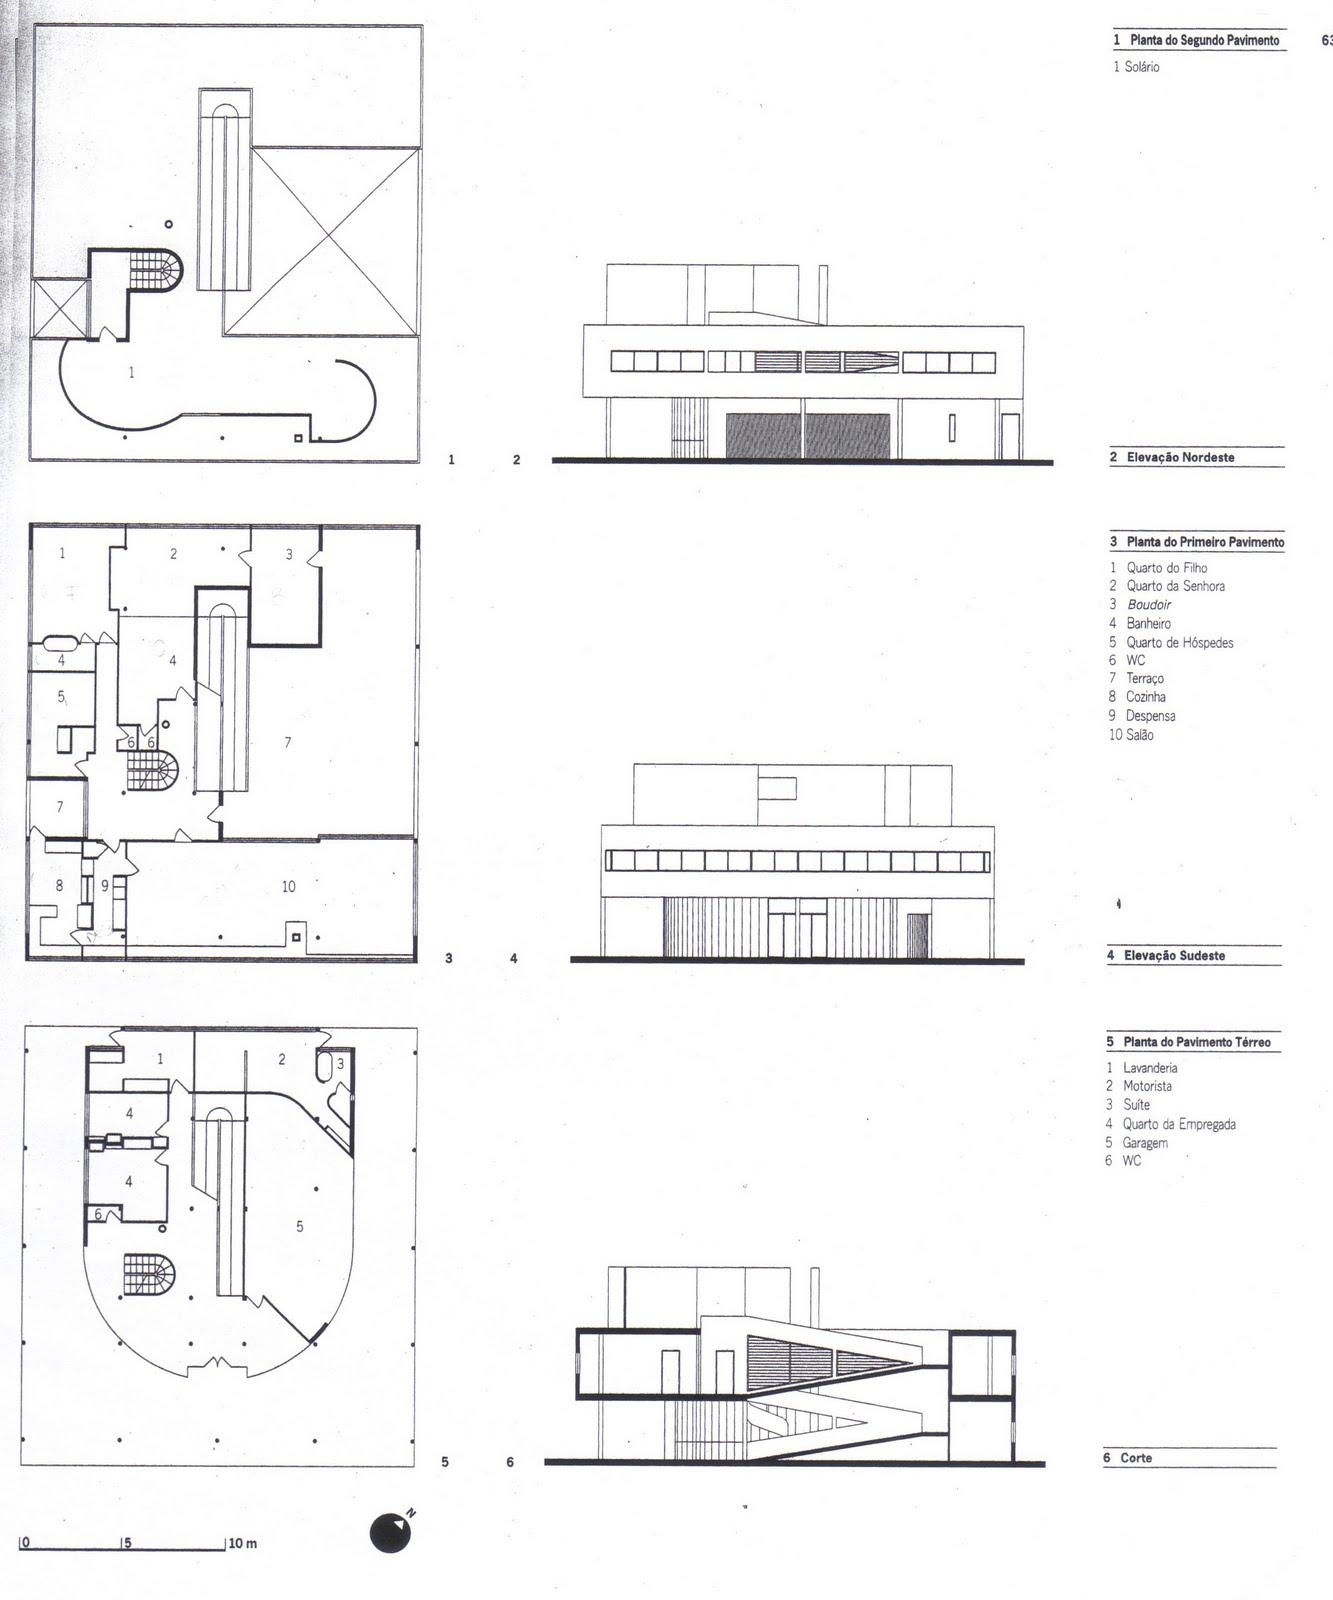 Planta Baixa De Garagem Modelos De Plantas De Casas With Planta